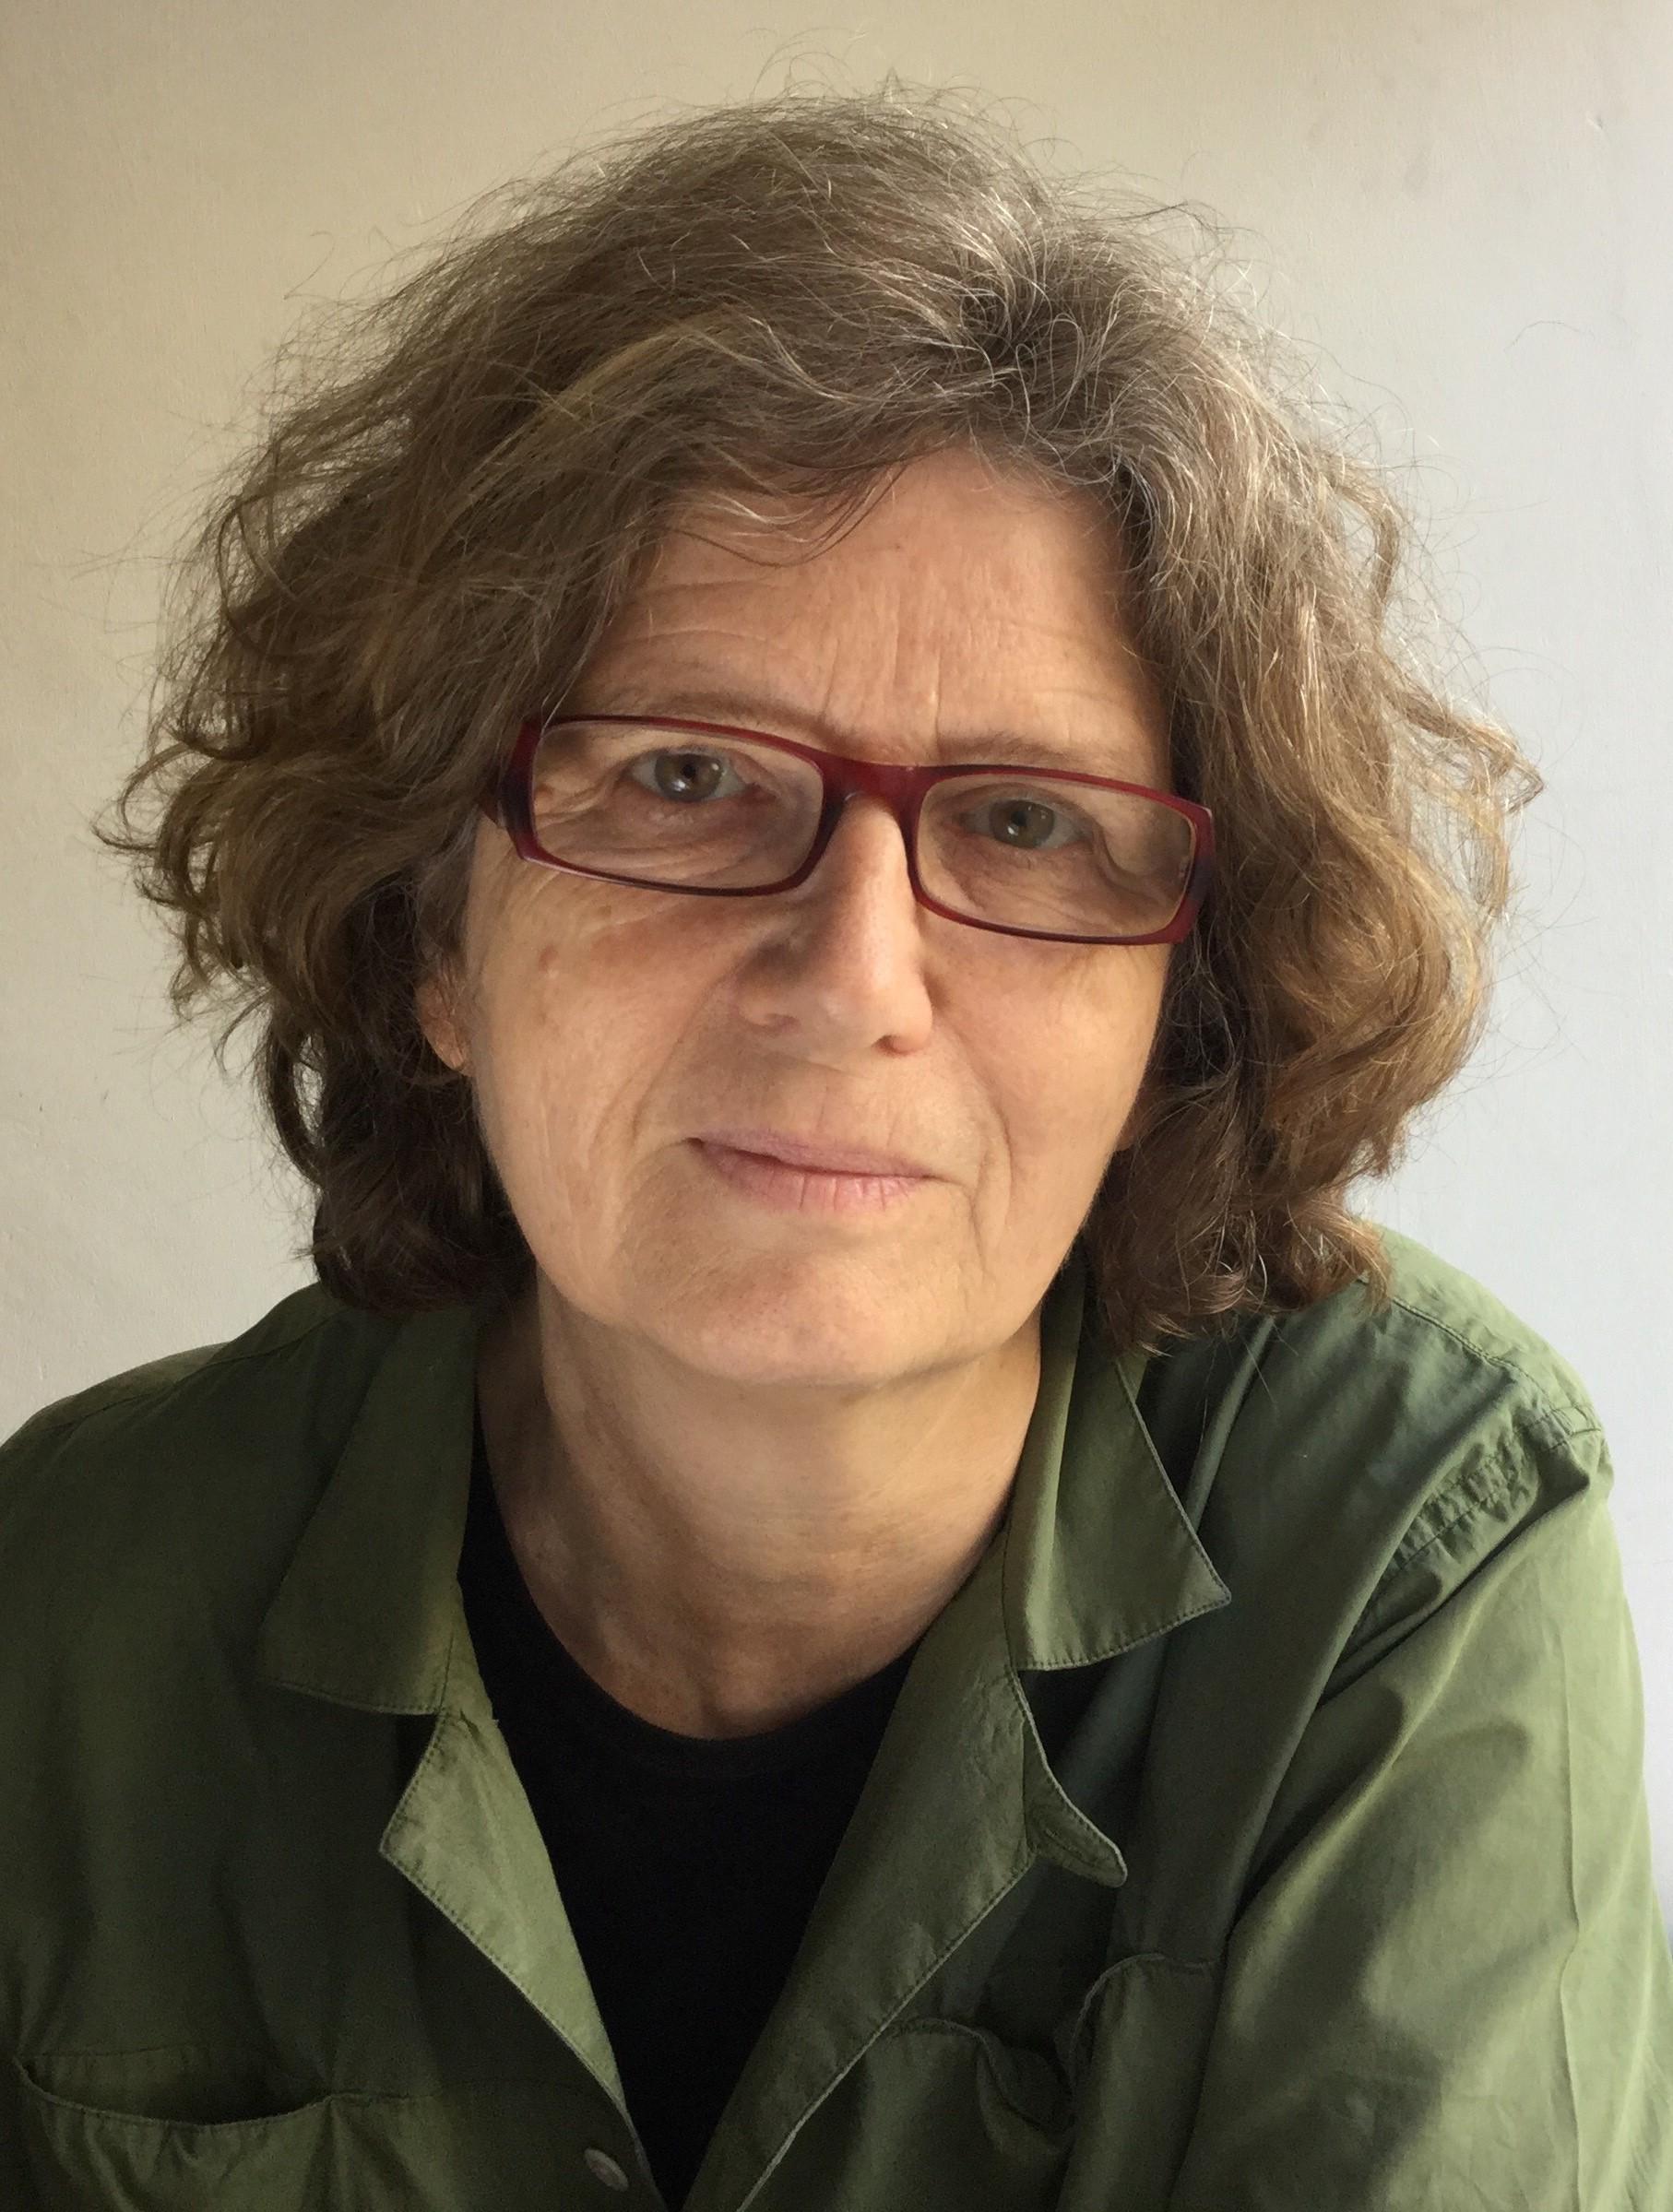 Vanessa Benson